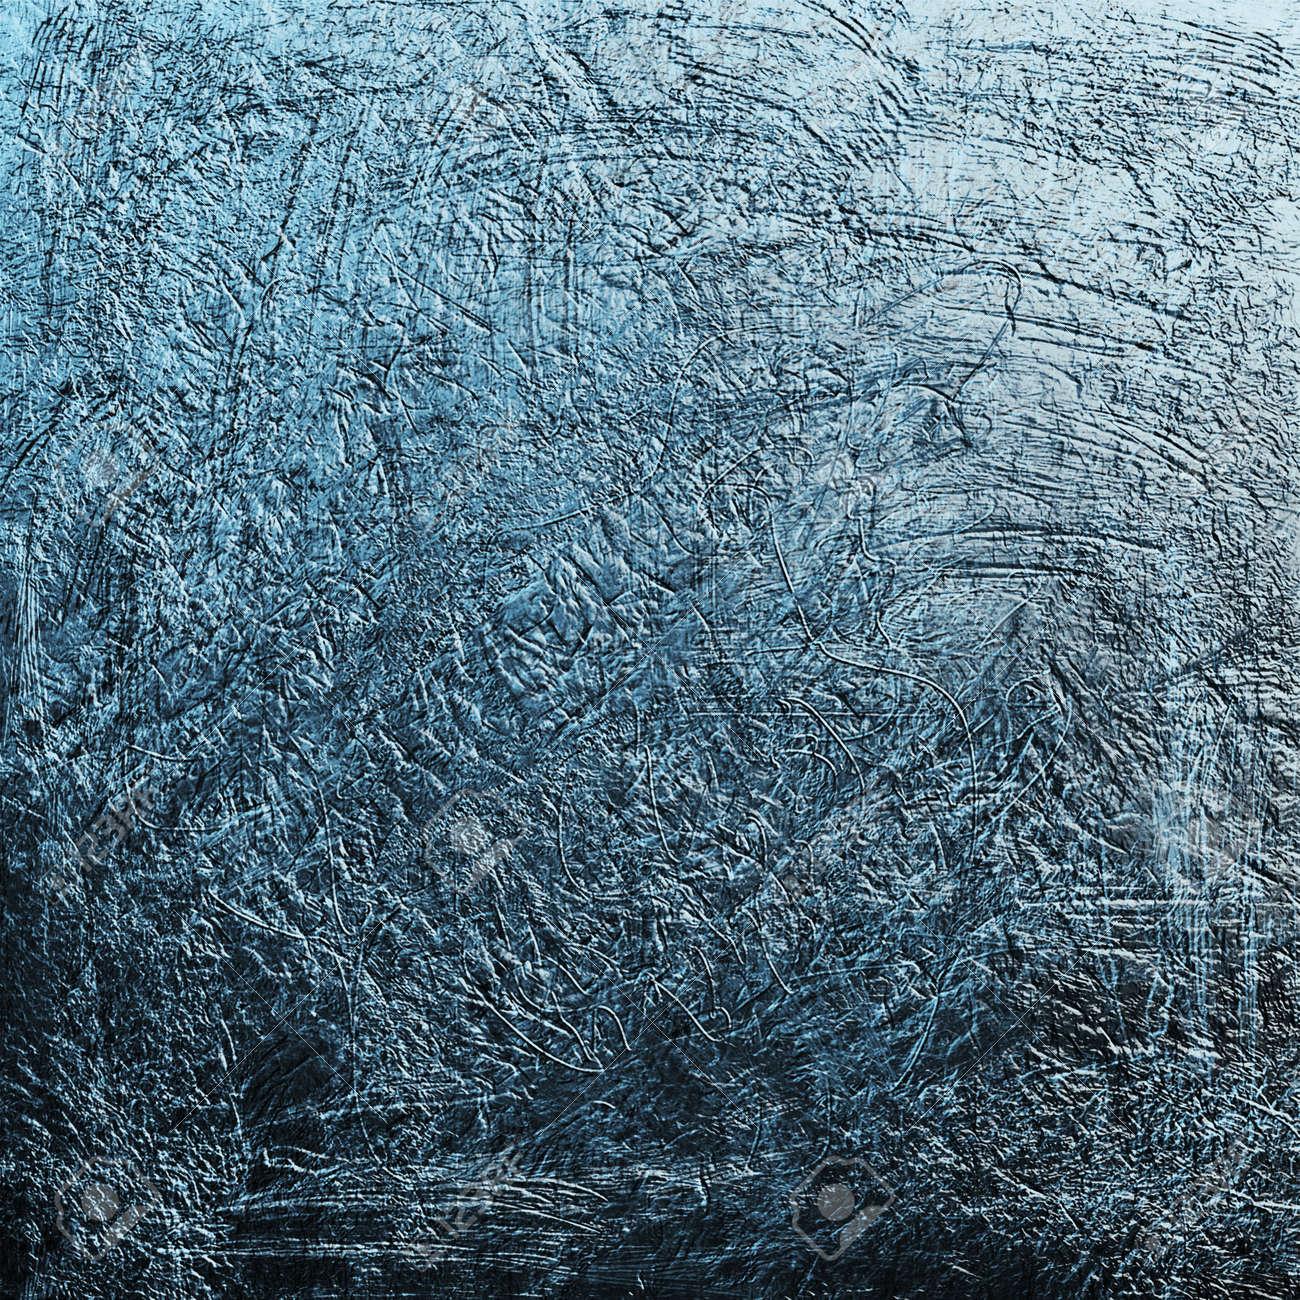 Blue grunge background texture created in Photoshop